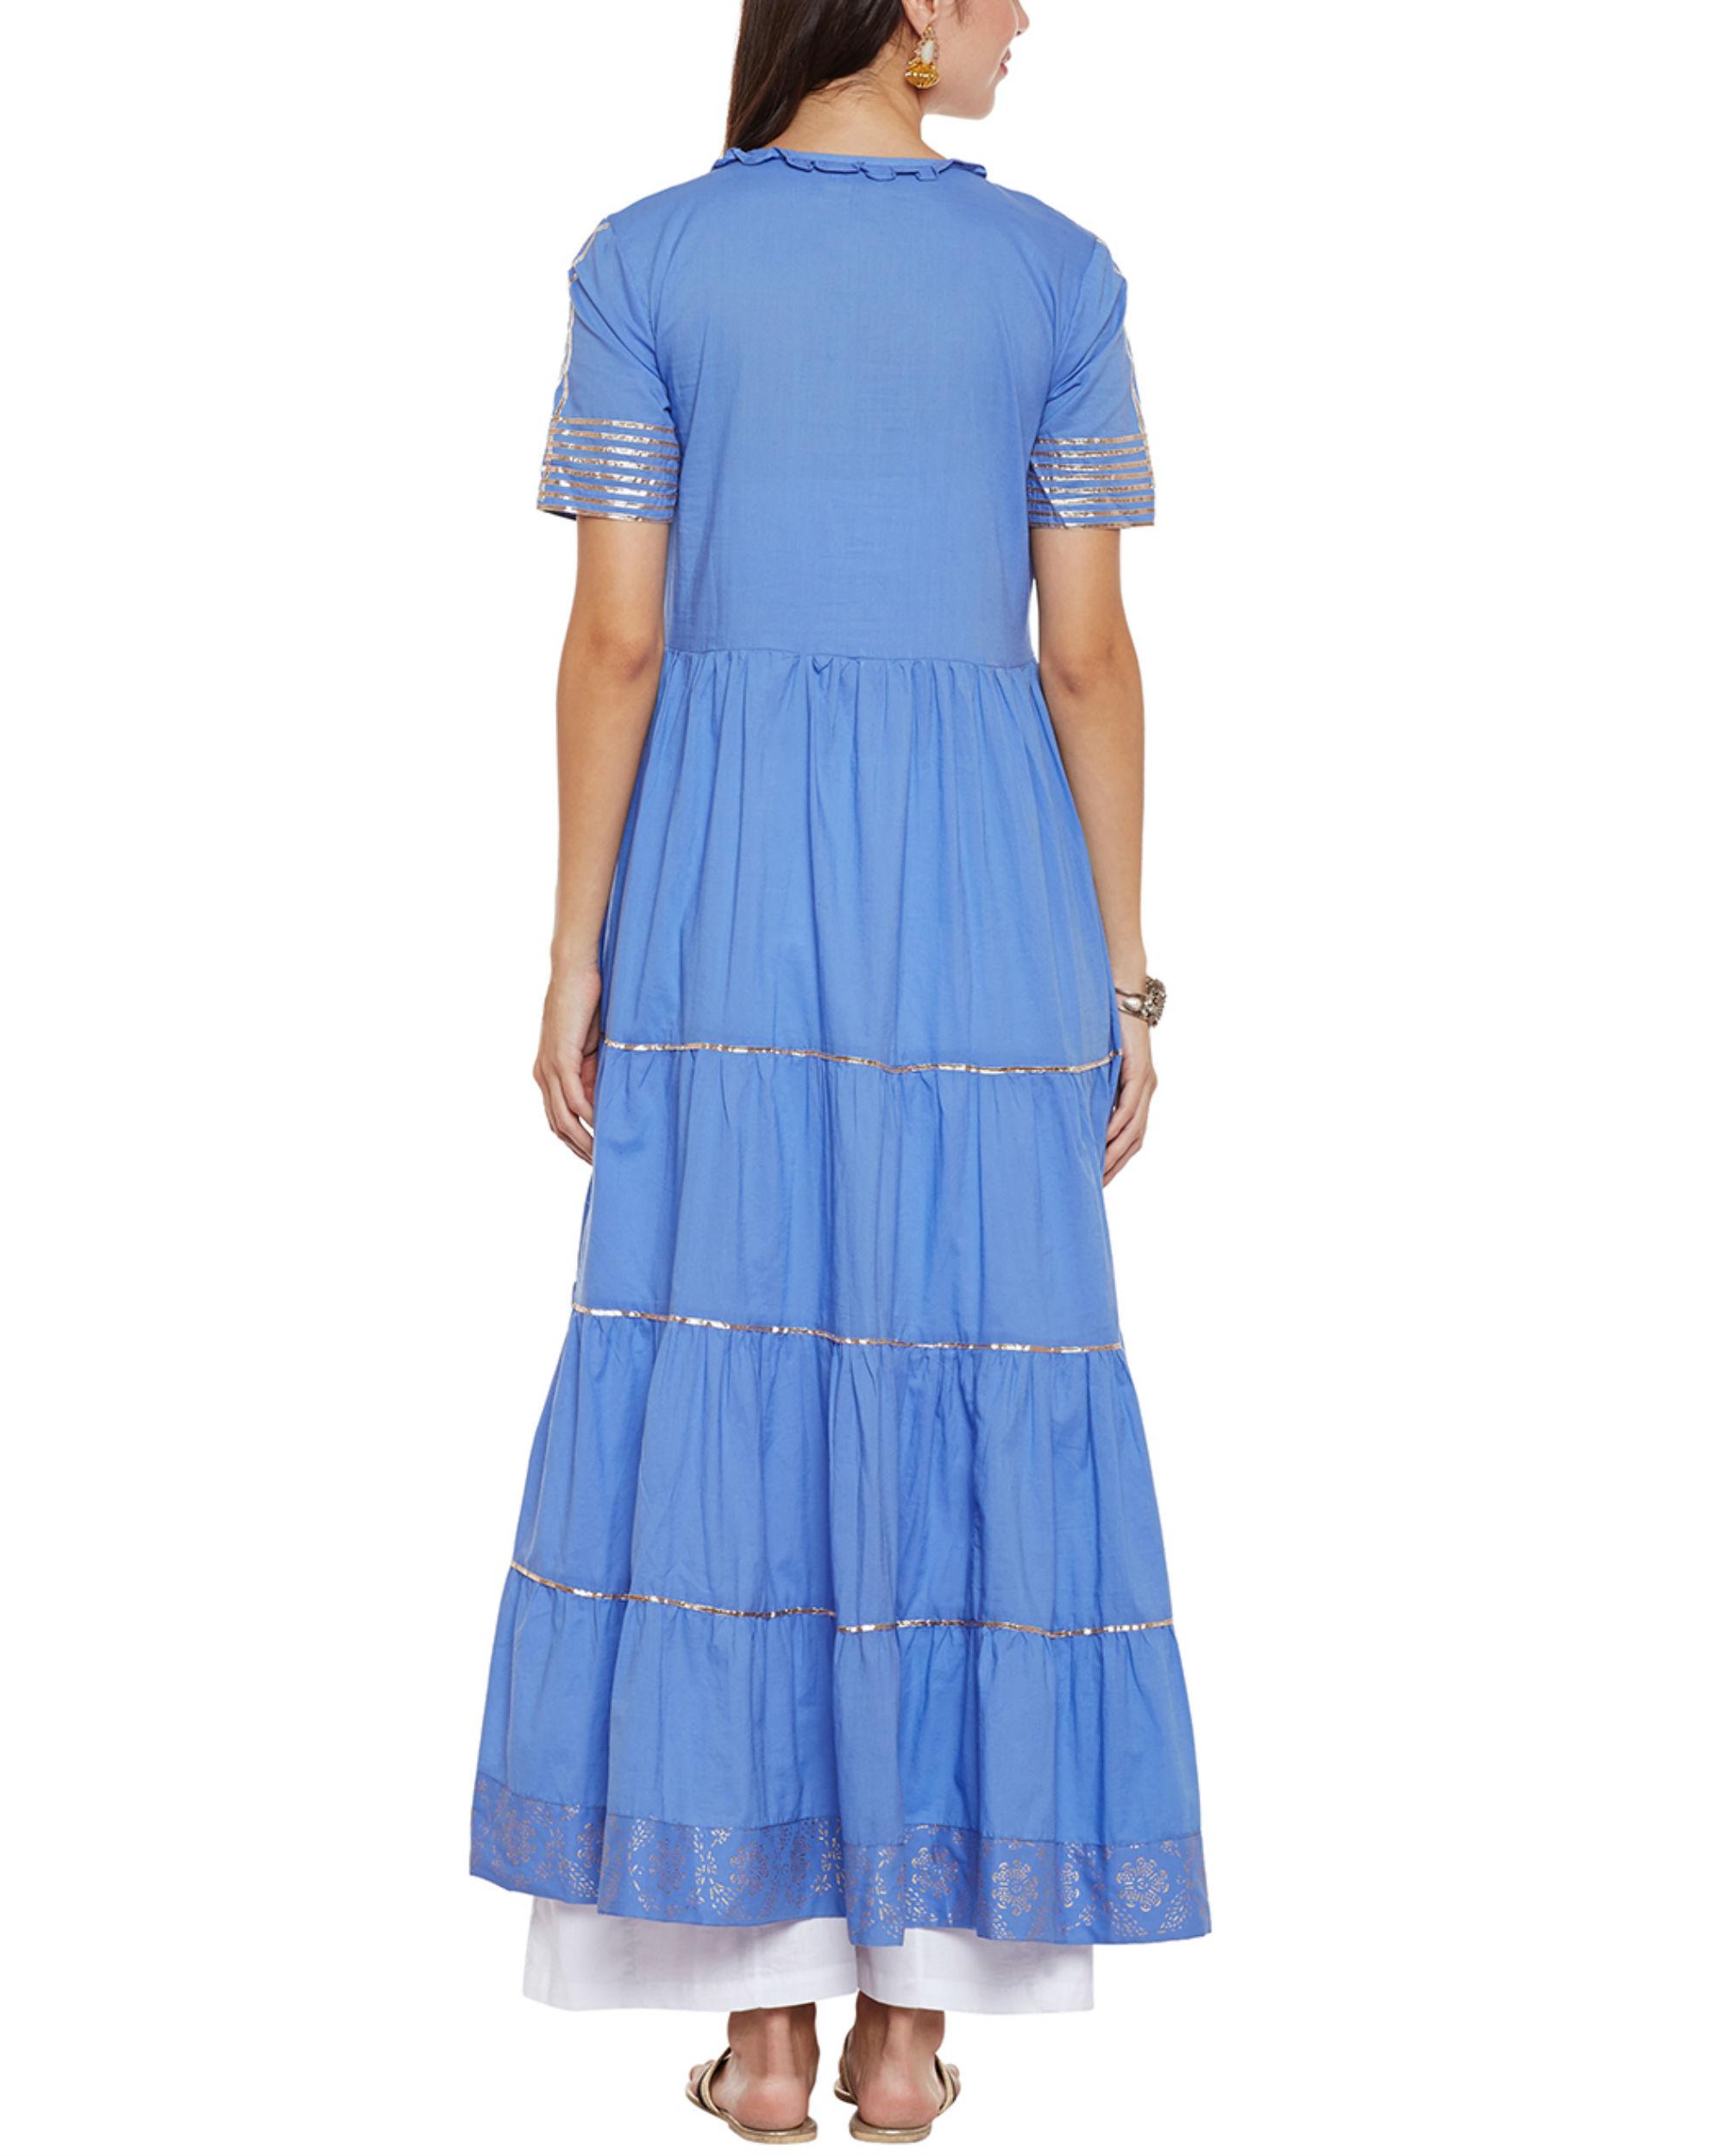 Blue Tier Gota Work Tunic By Lyla The Secret Label